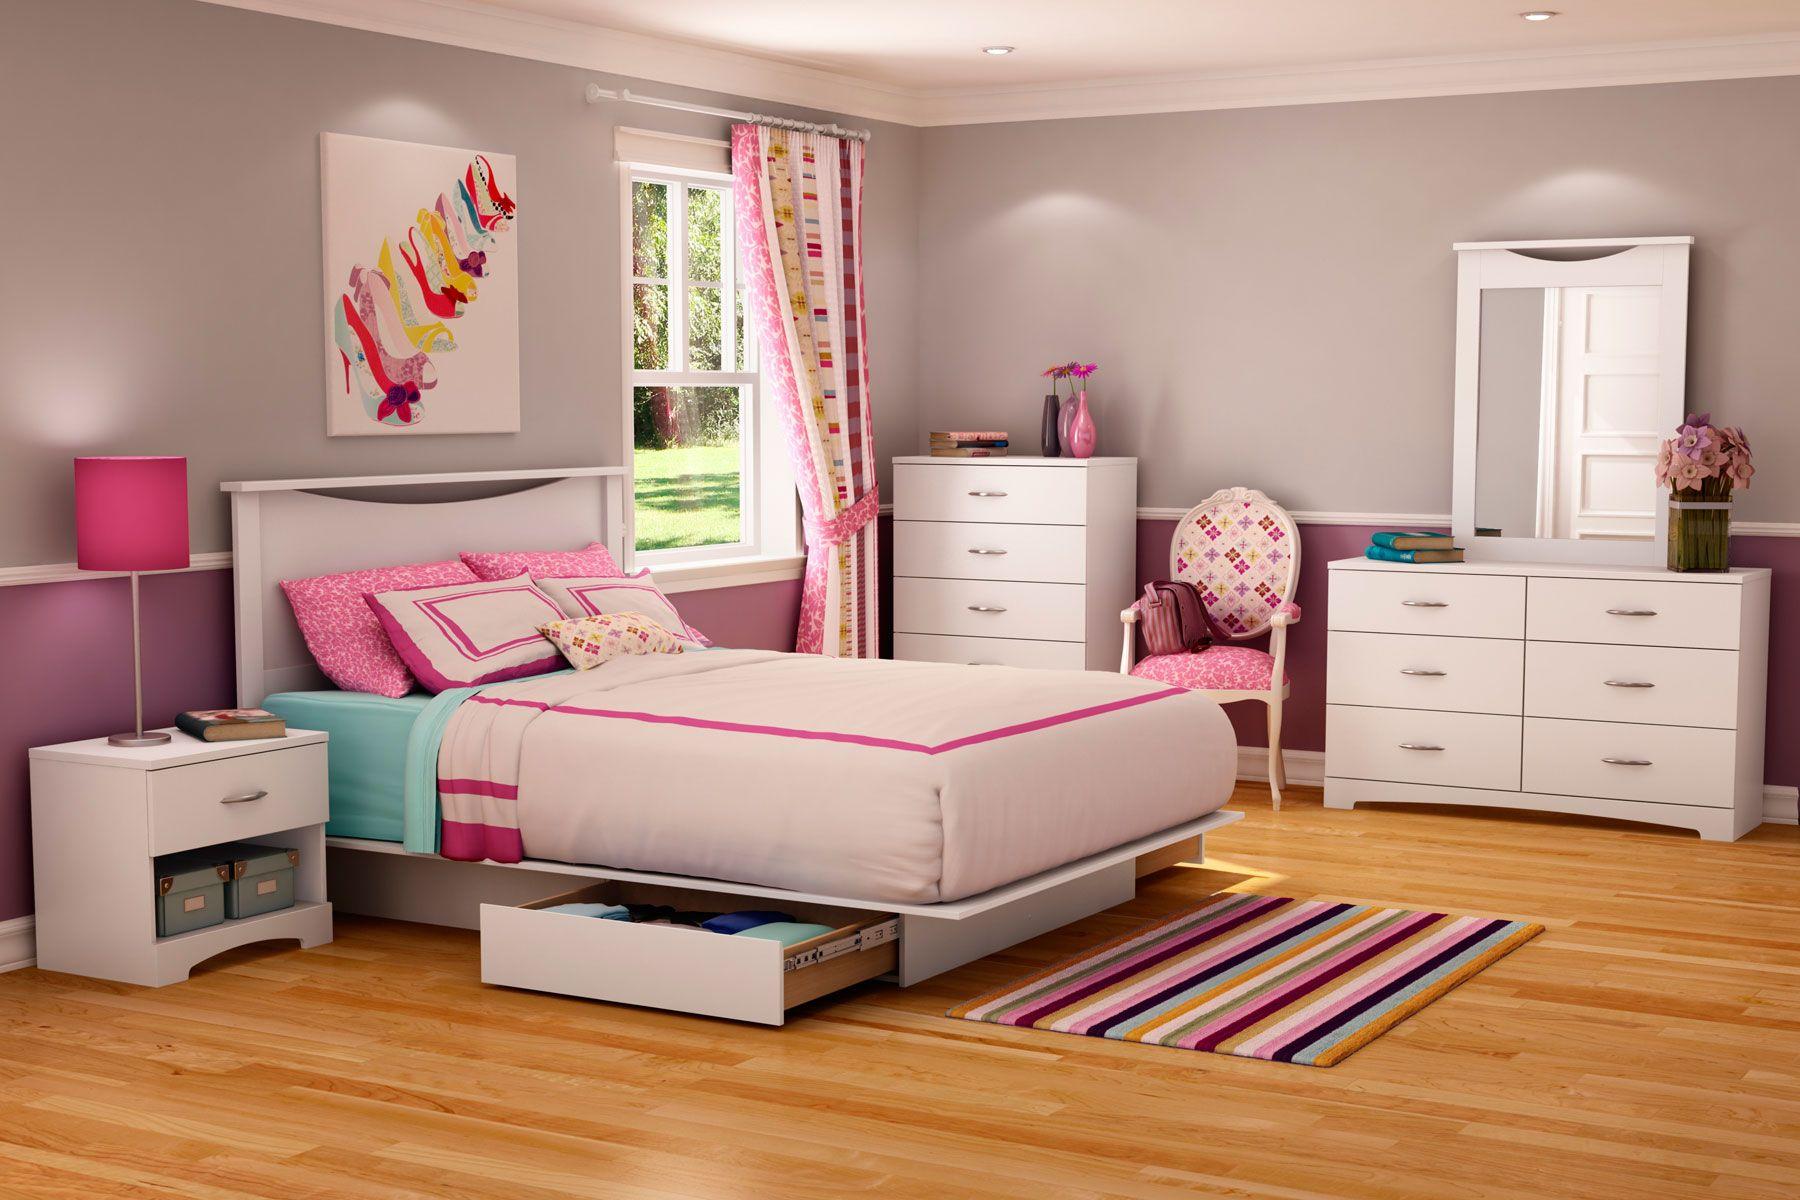 Platform Bedroom Set in Pure White